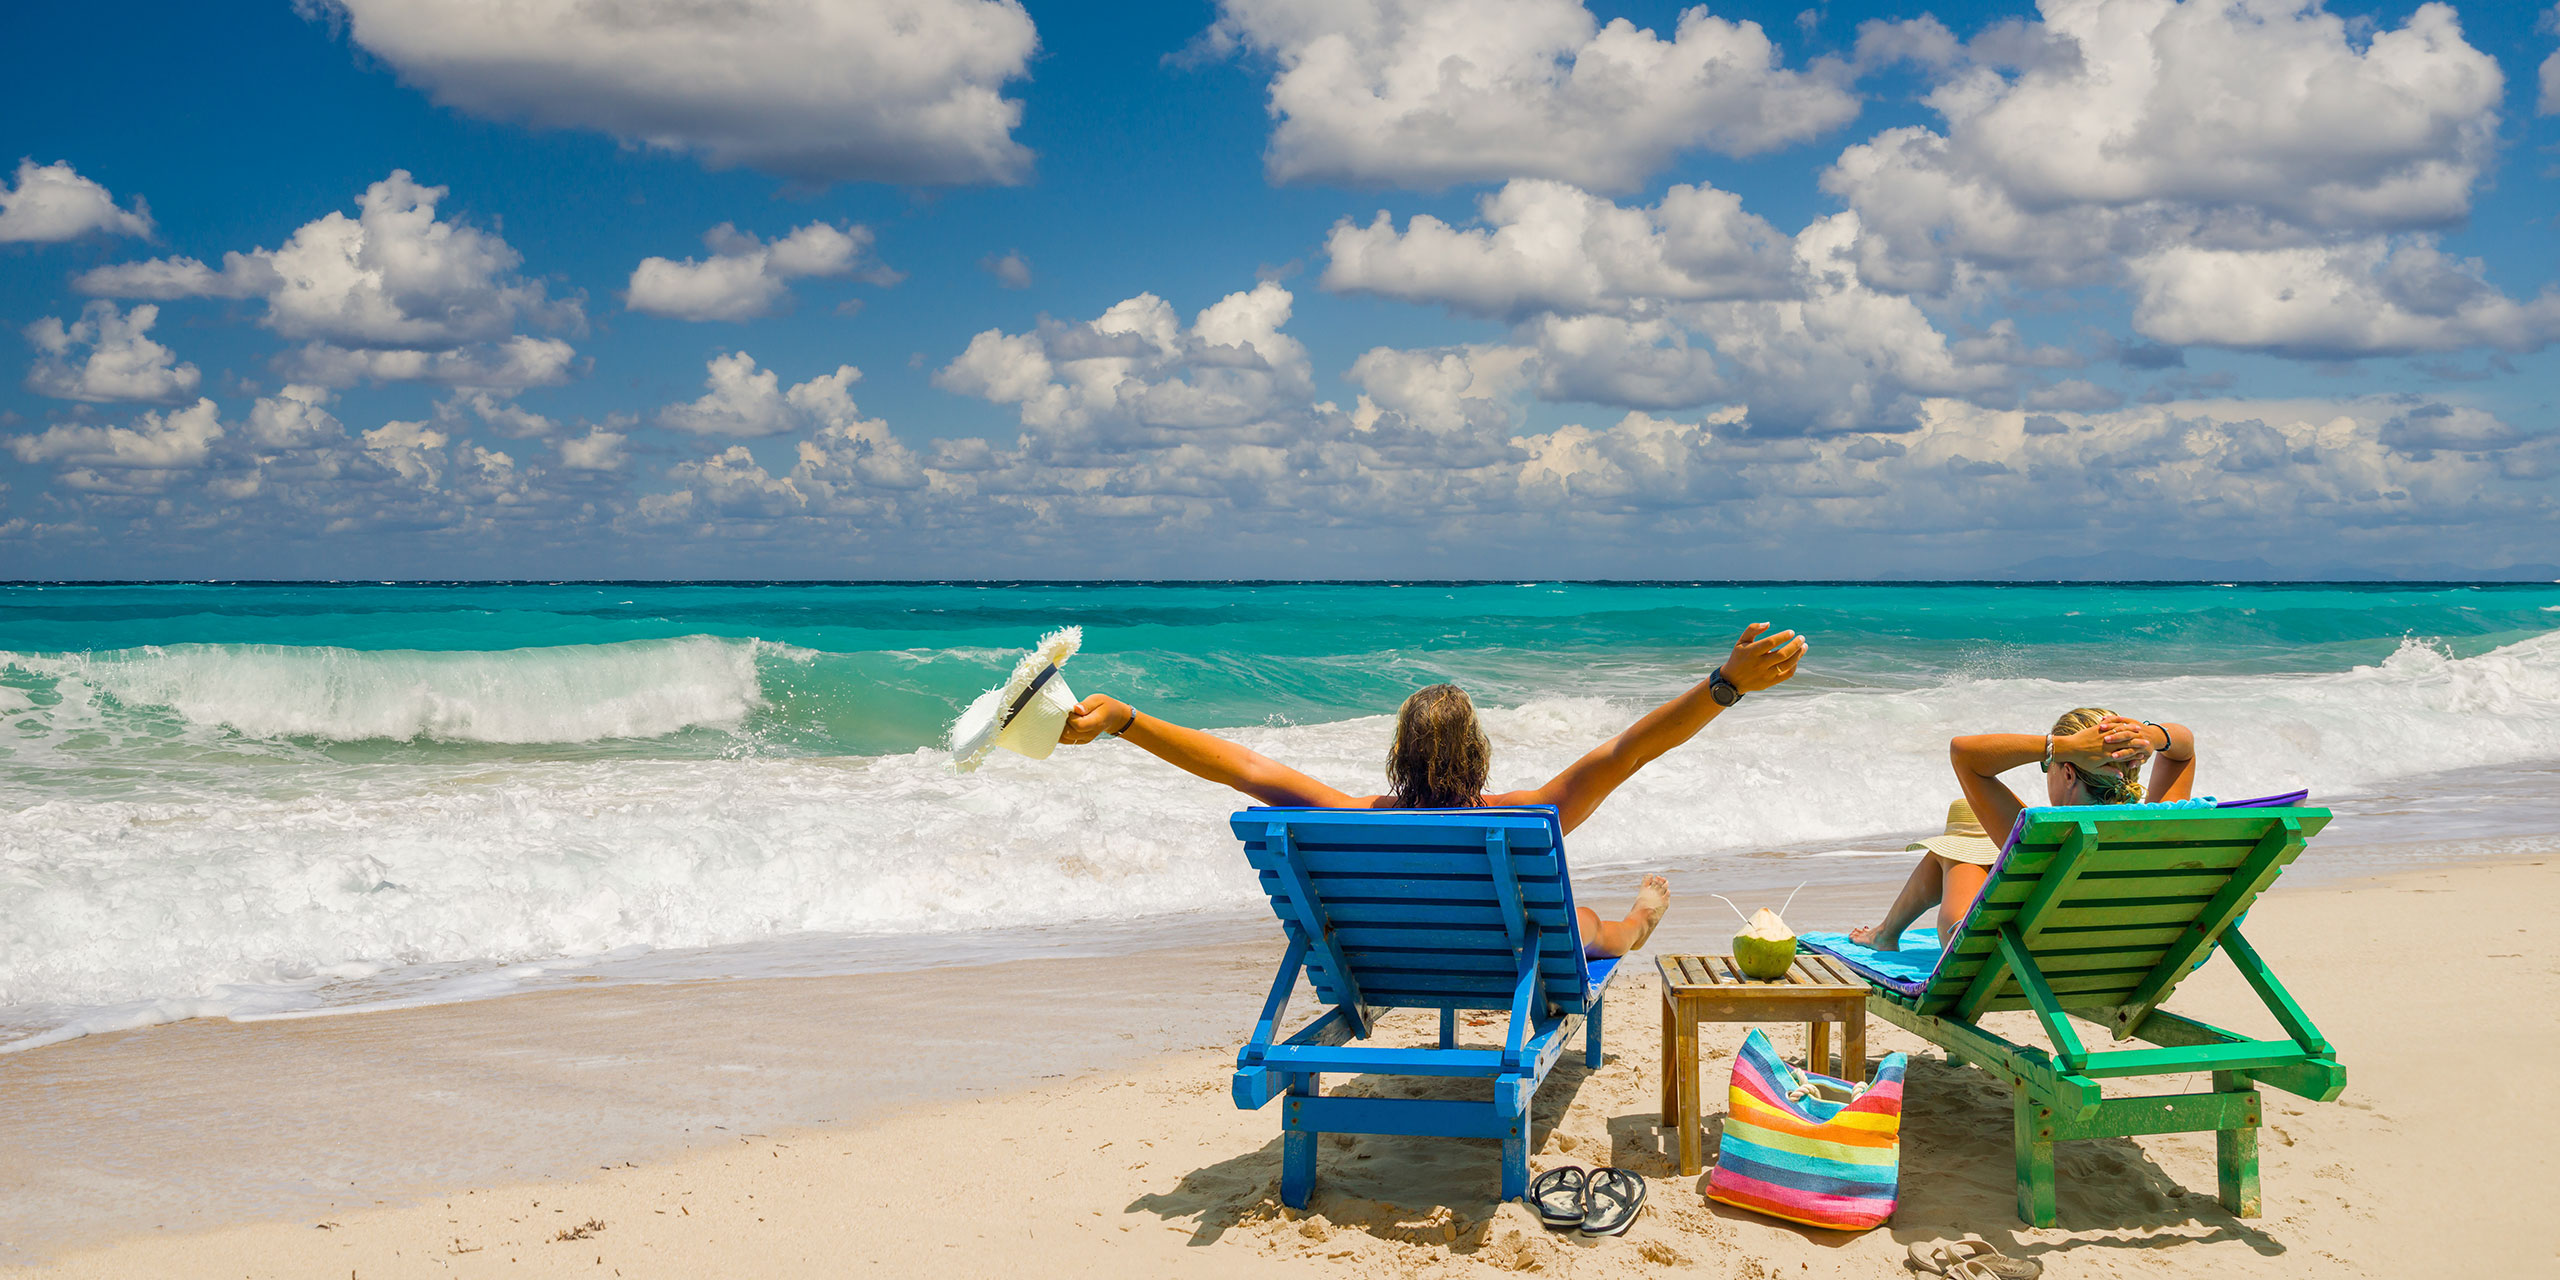 Couple on Beach; Courtesy of Netfalls Remy Musser/ Shutterstock.com